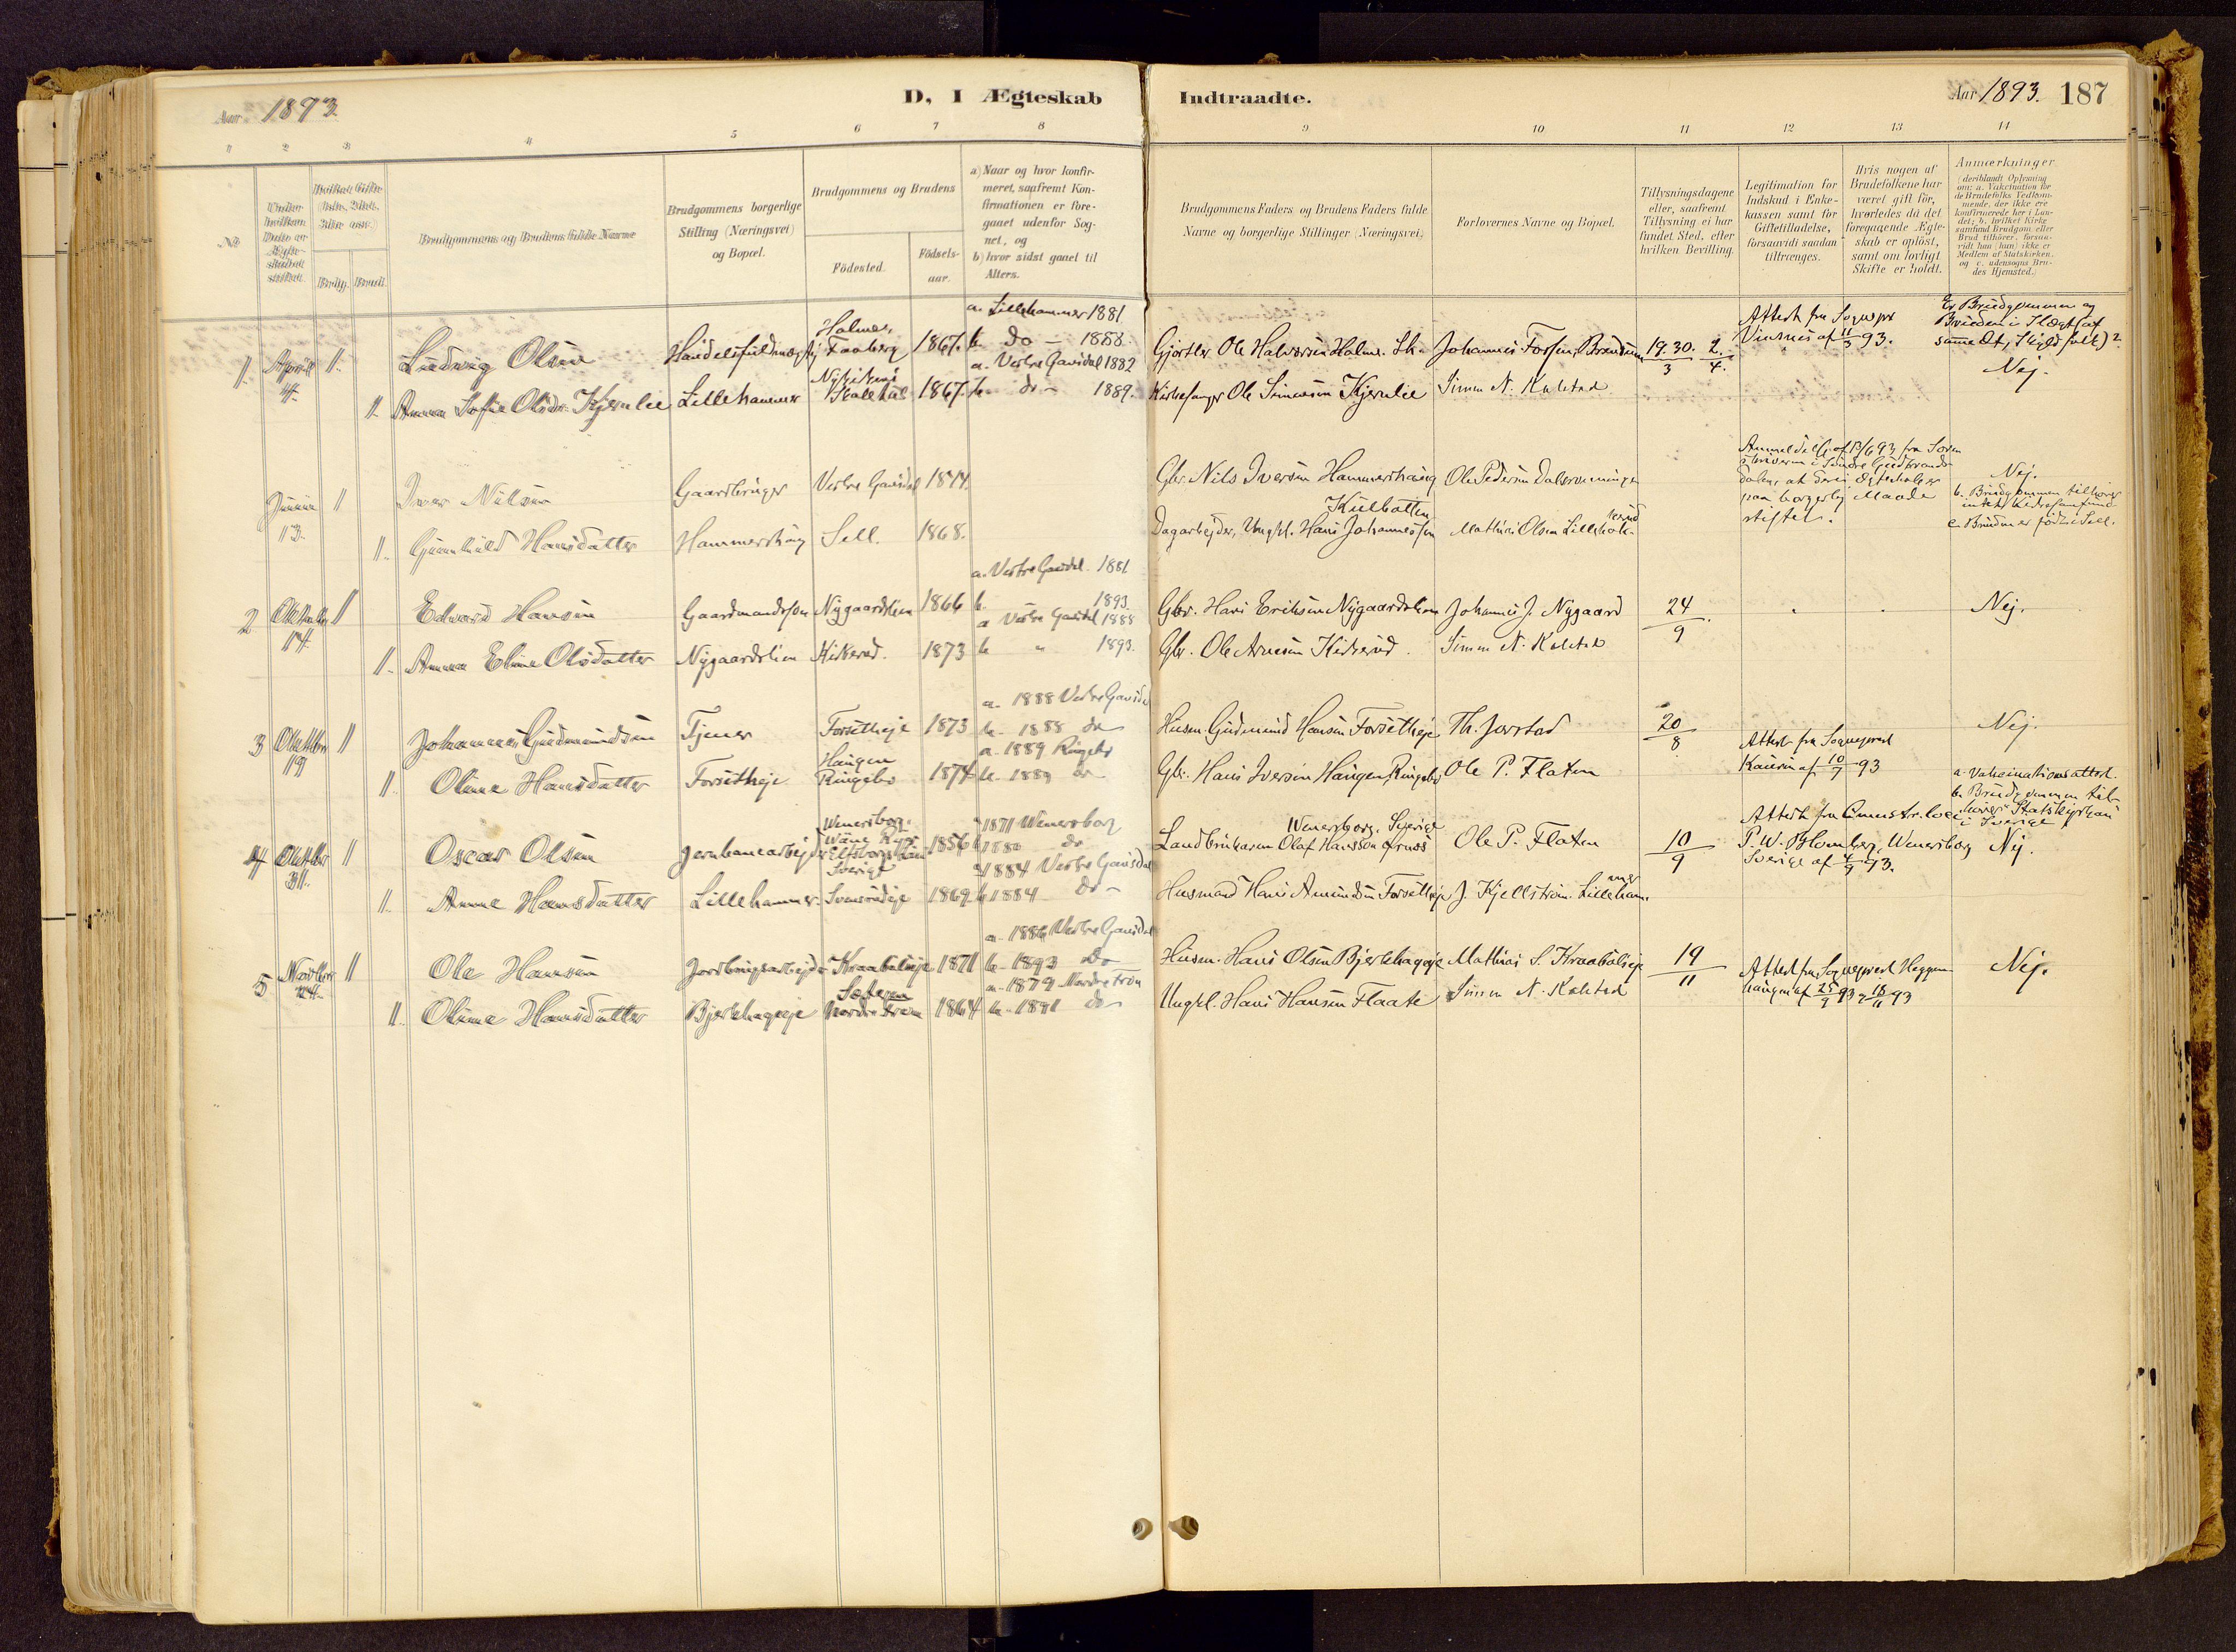 SAH, Vestre Gausdal prestekontor, Ministerialbok nr. 1, 1887-1914, s. 187